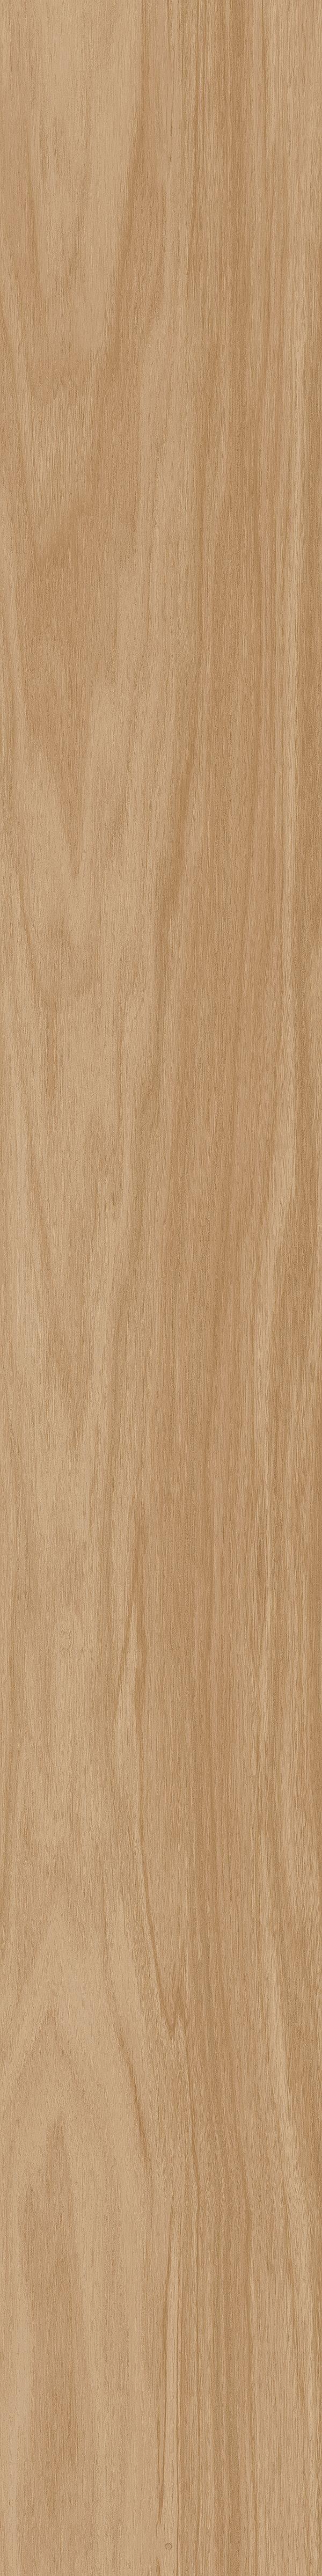 Southern Woods Flooring Floor Refinishing Bethlehem Ga Luxury Vinyl Living Local Clic Western Mohawk Group